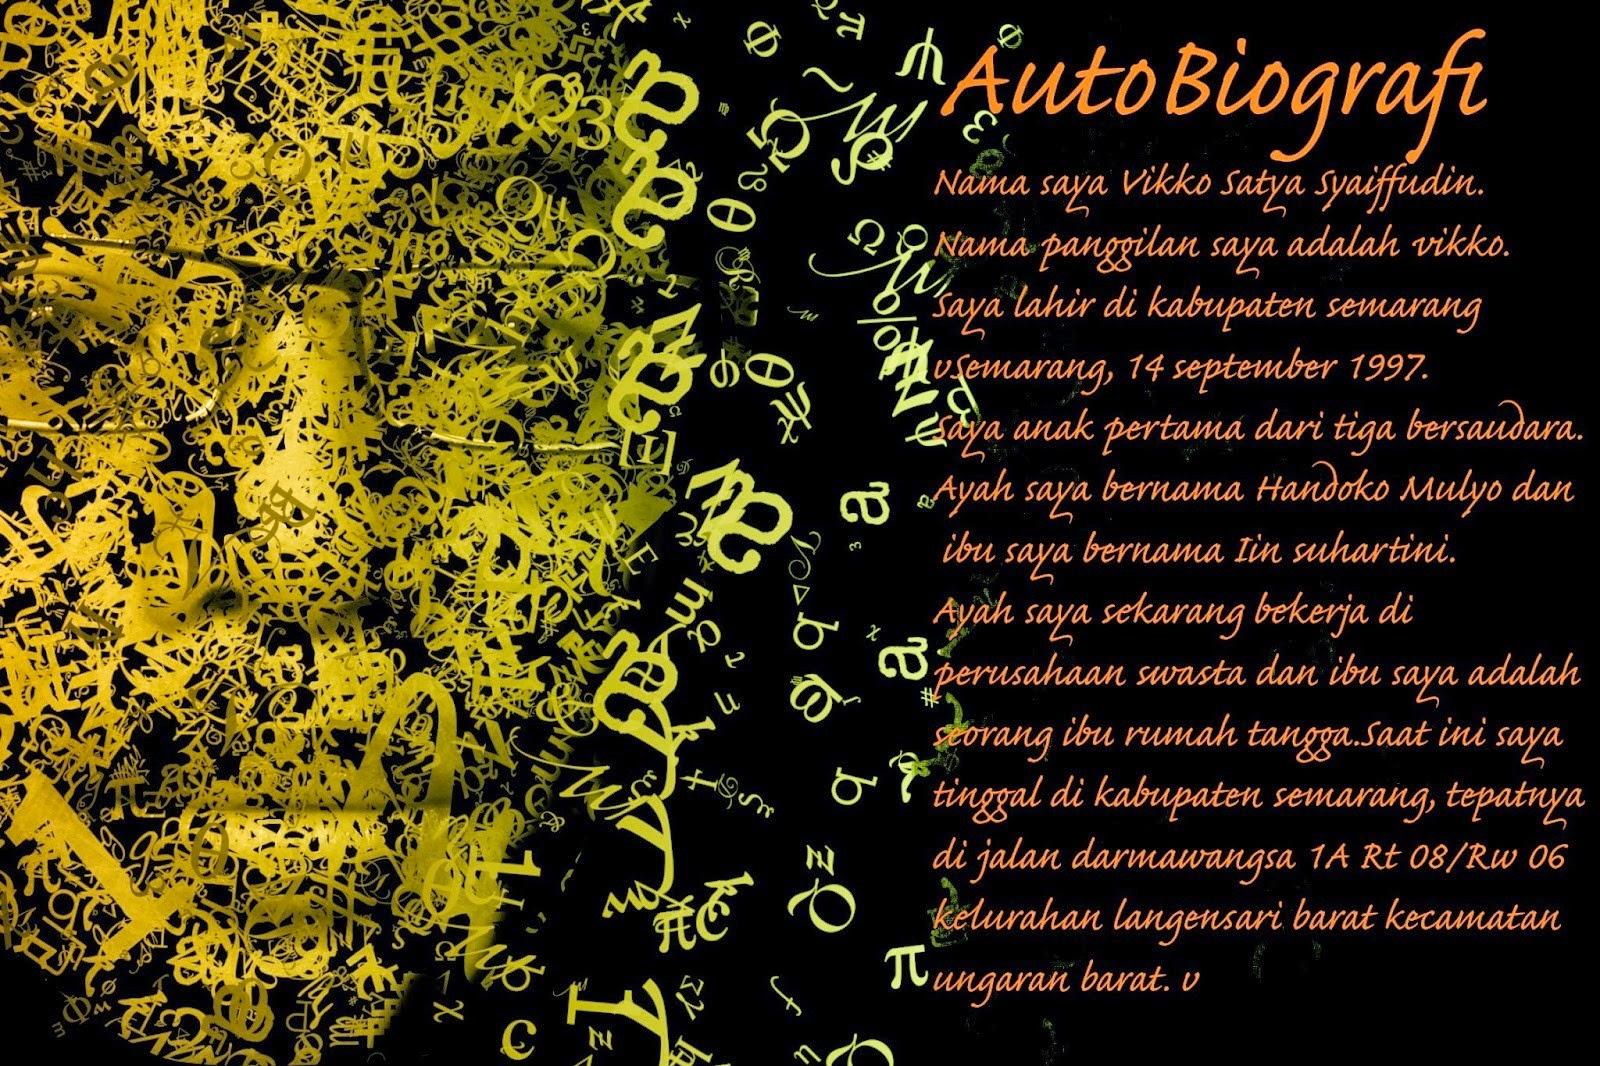 Pengertian Autobiografi Dan Contoh Autobiografi Perpustakaan Vikko